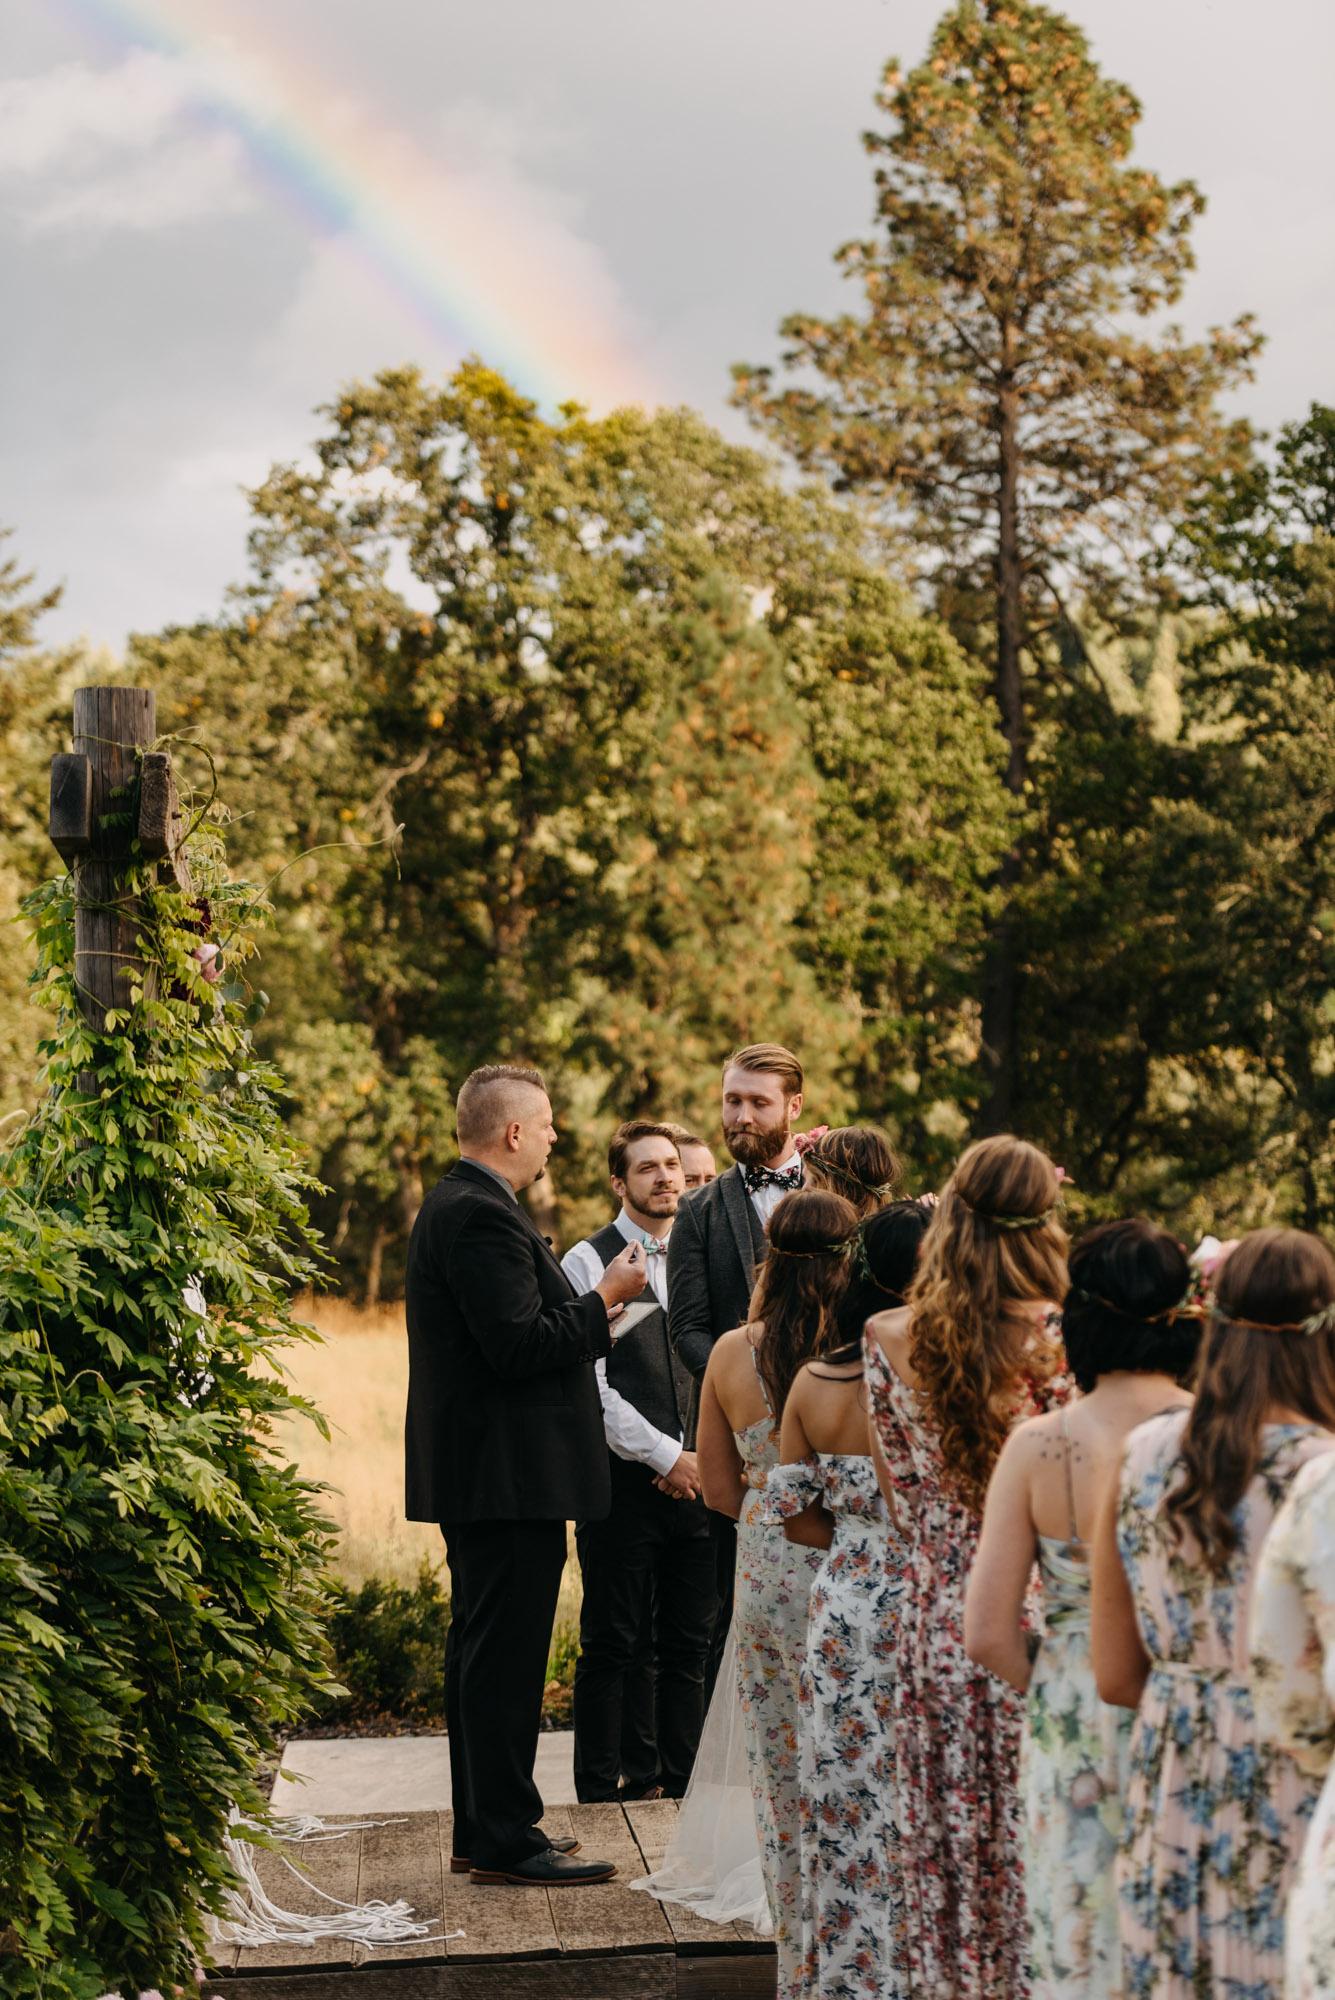 Outdoor-Summer-Ceremony-Washington-Wedding-Rainbow-8968.jpg